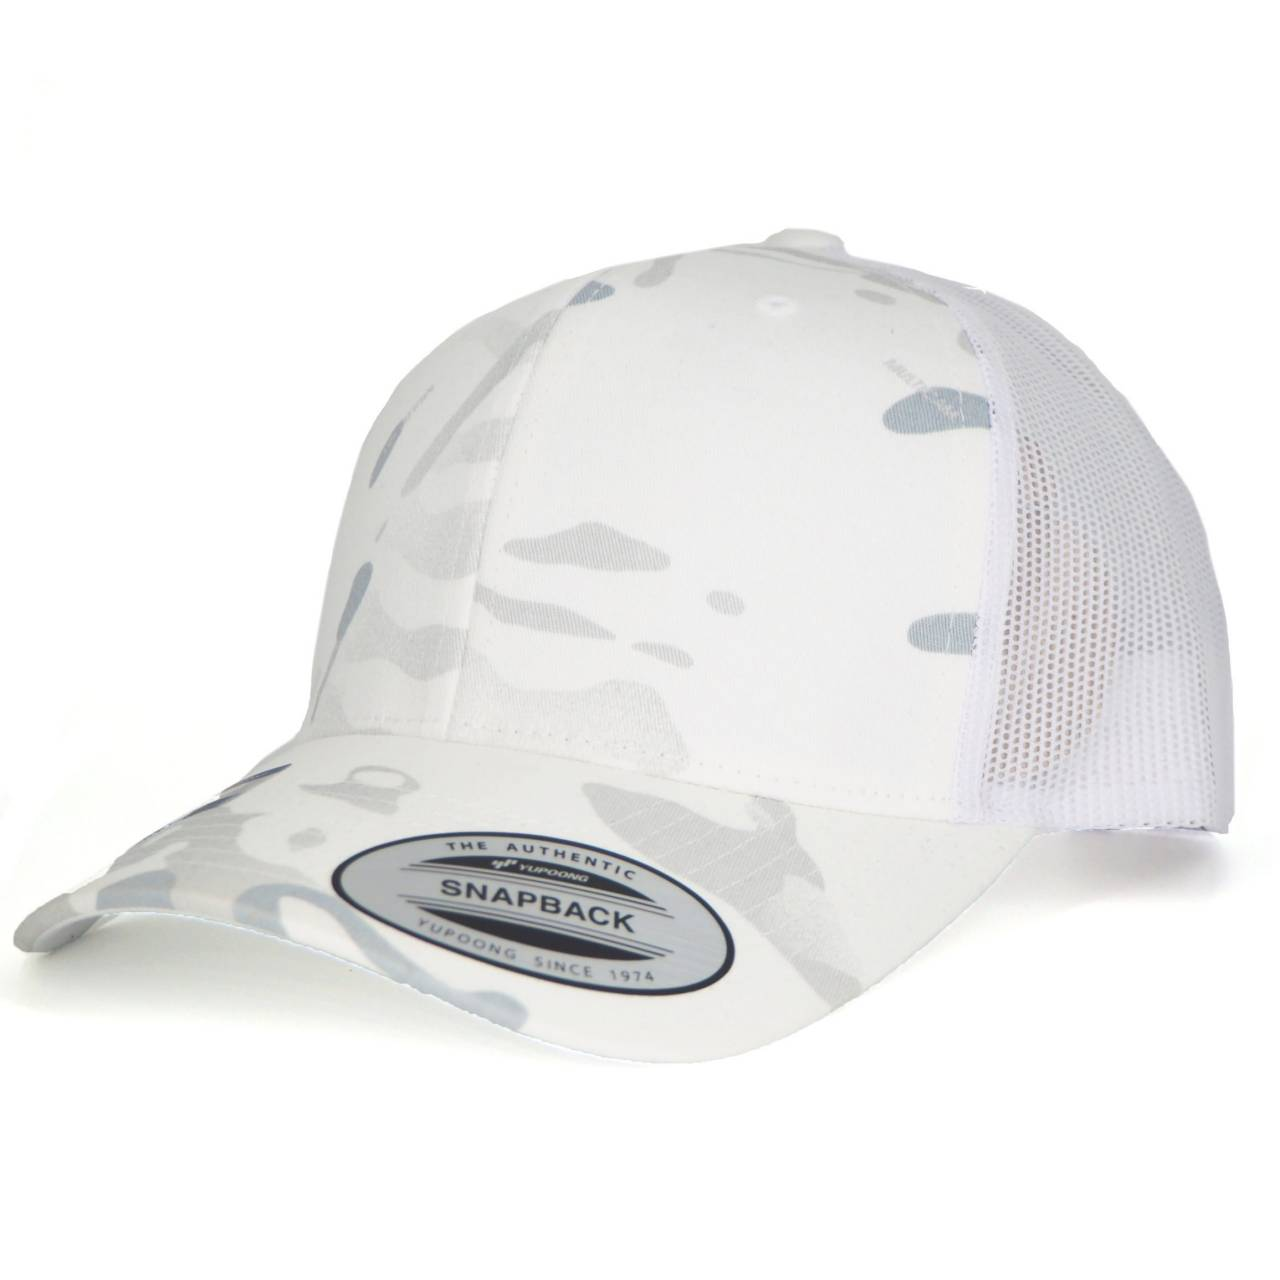 6606MC-02556-0050 RETRO TRUCKER ALPINE MULTICAMO CAP